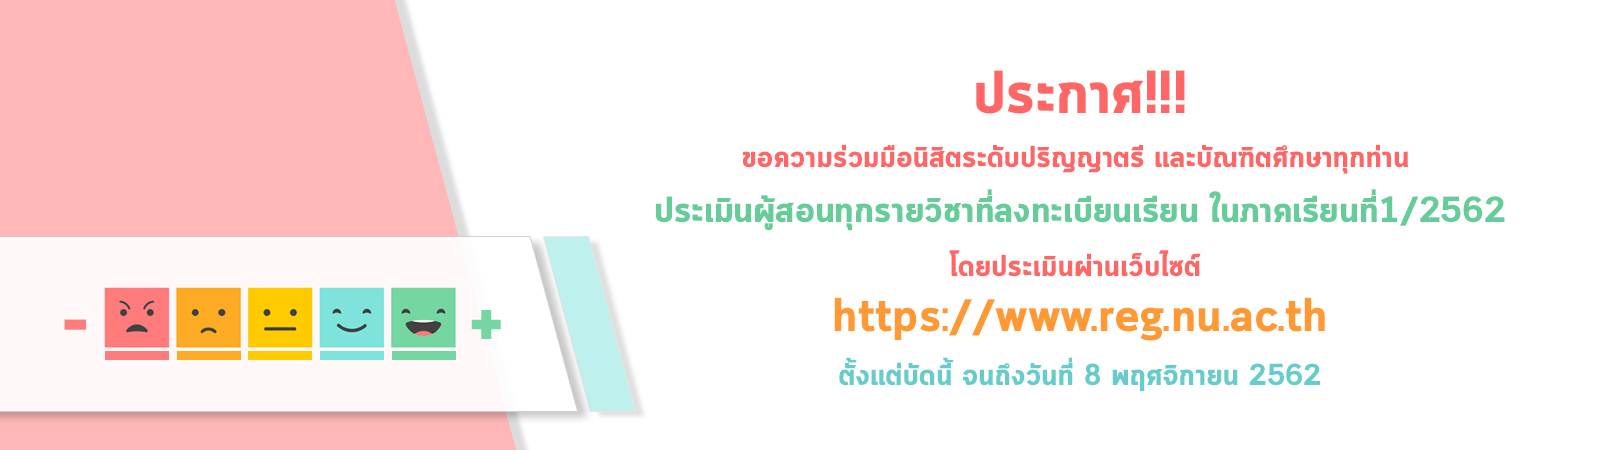 slideFeature-04